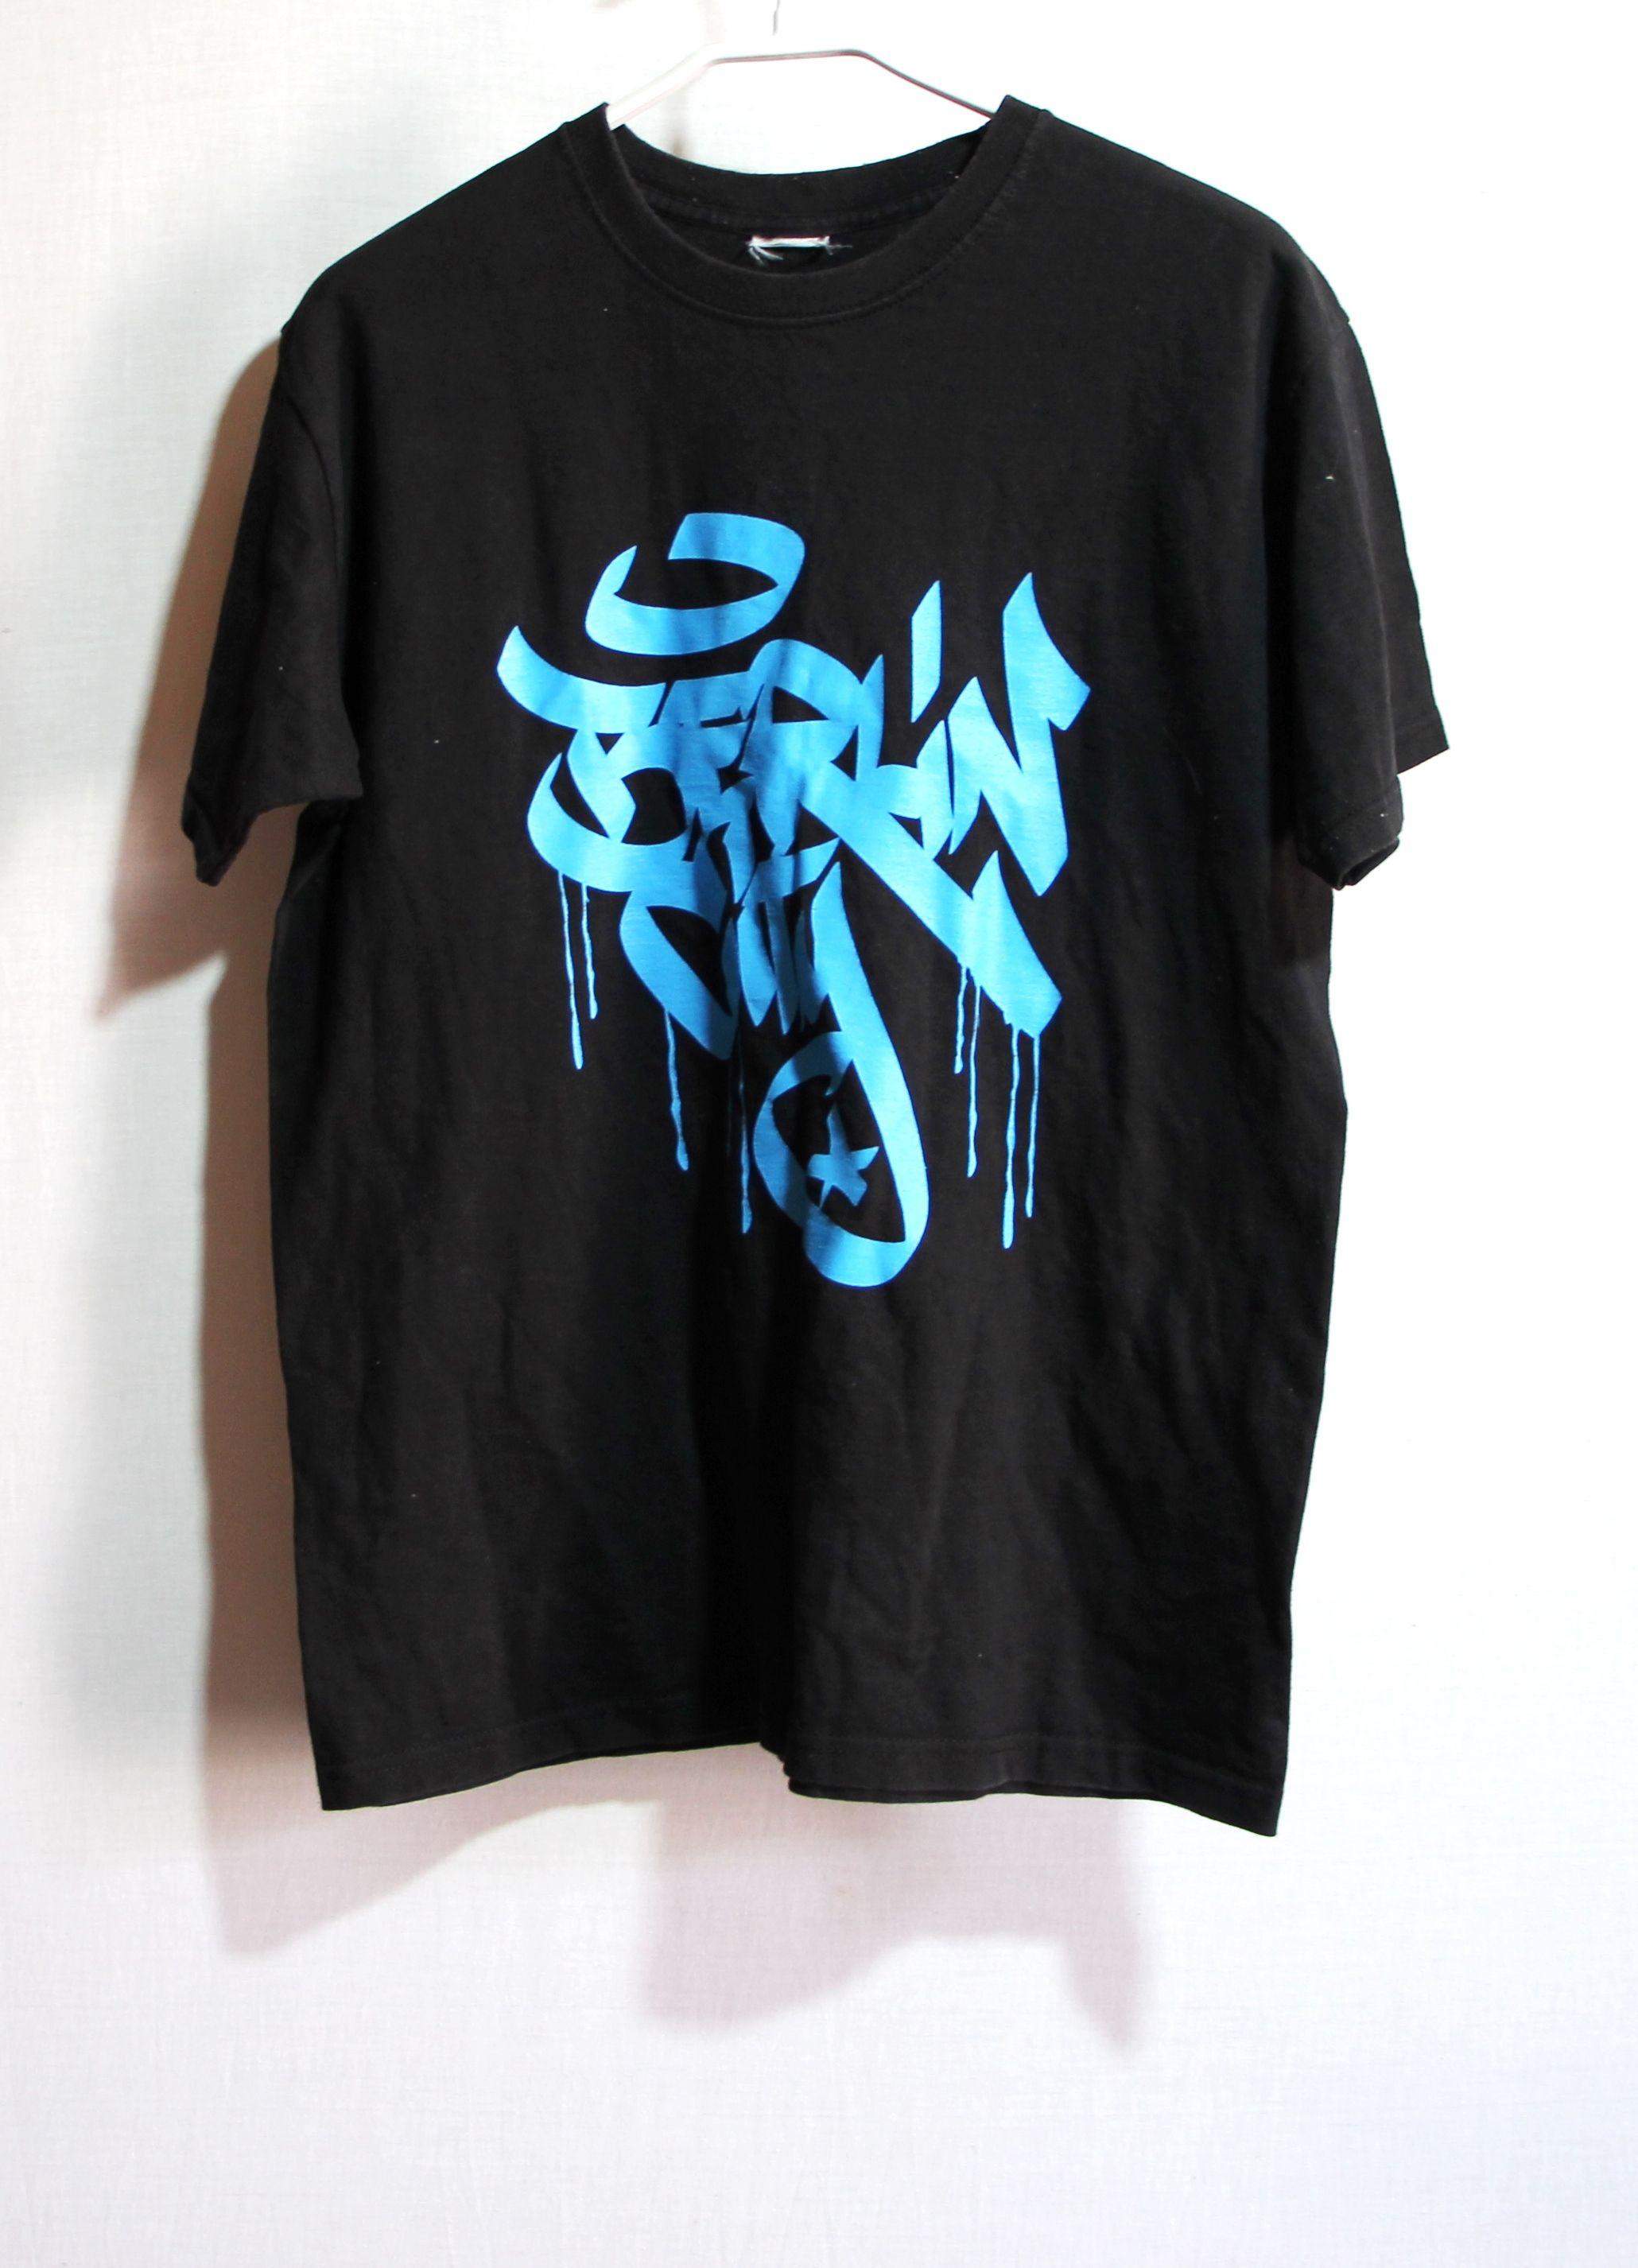 Vintage T Shirt Berlin City Graffiti Black T Shirts Mens Streetwear Tshirts Size Small S Retro Mens T Shirts Short Sleeves In 2020 Vintage Mens T Shirts Mens Tshirts Mens Streetwear